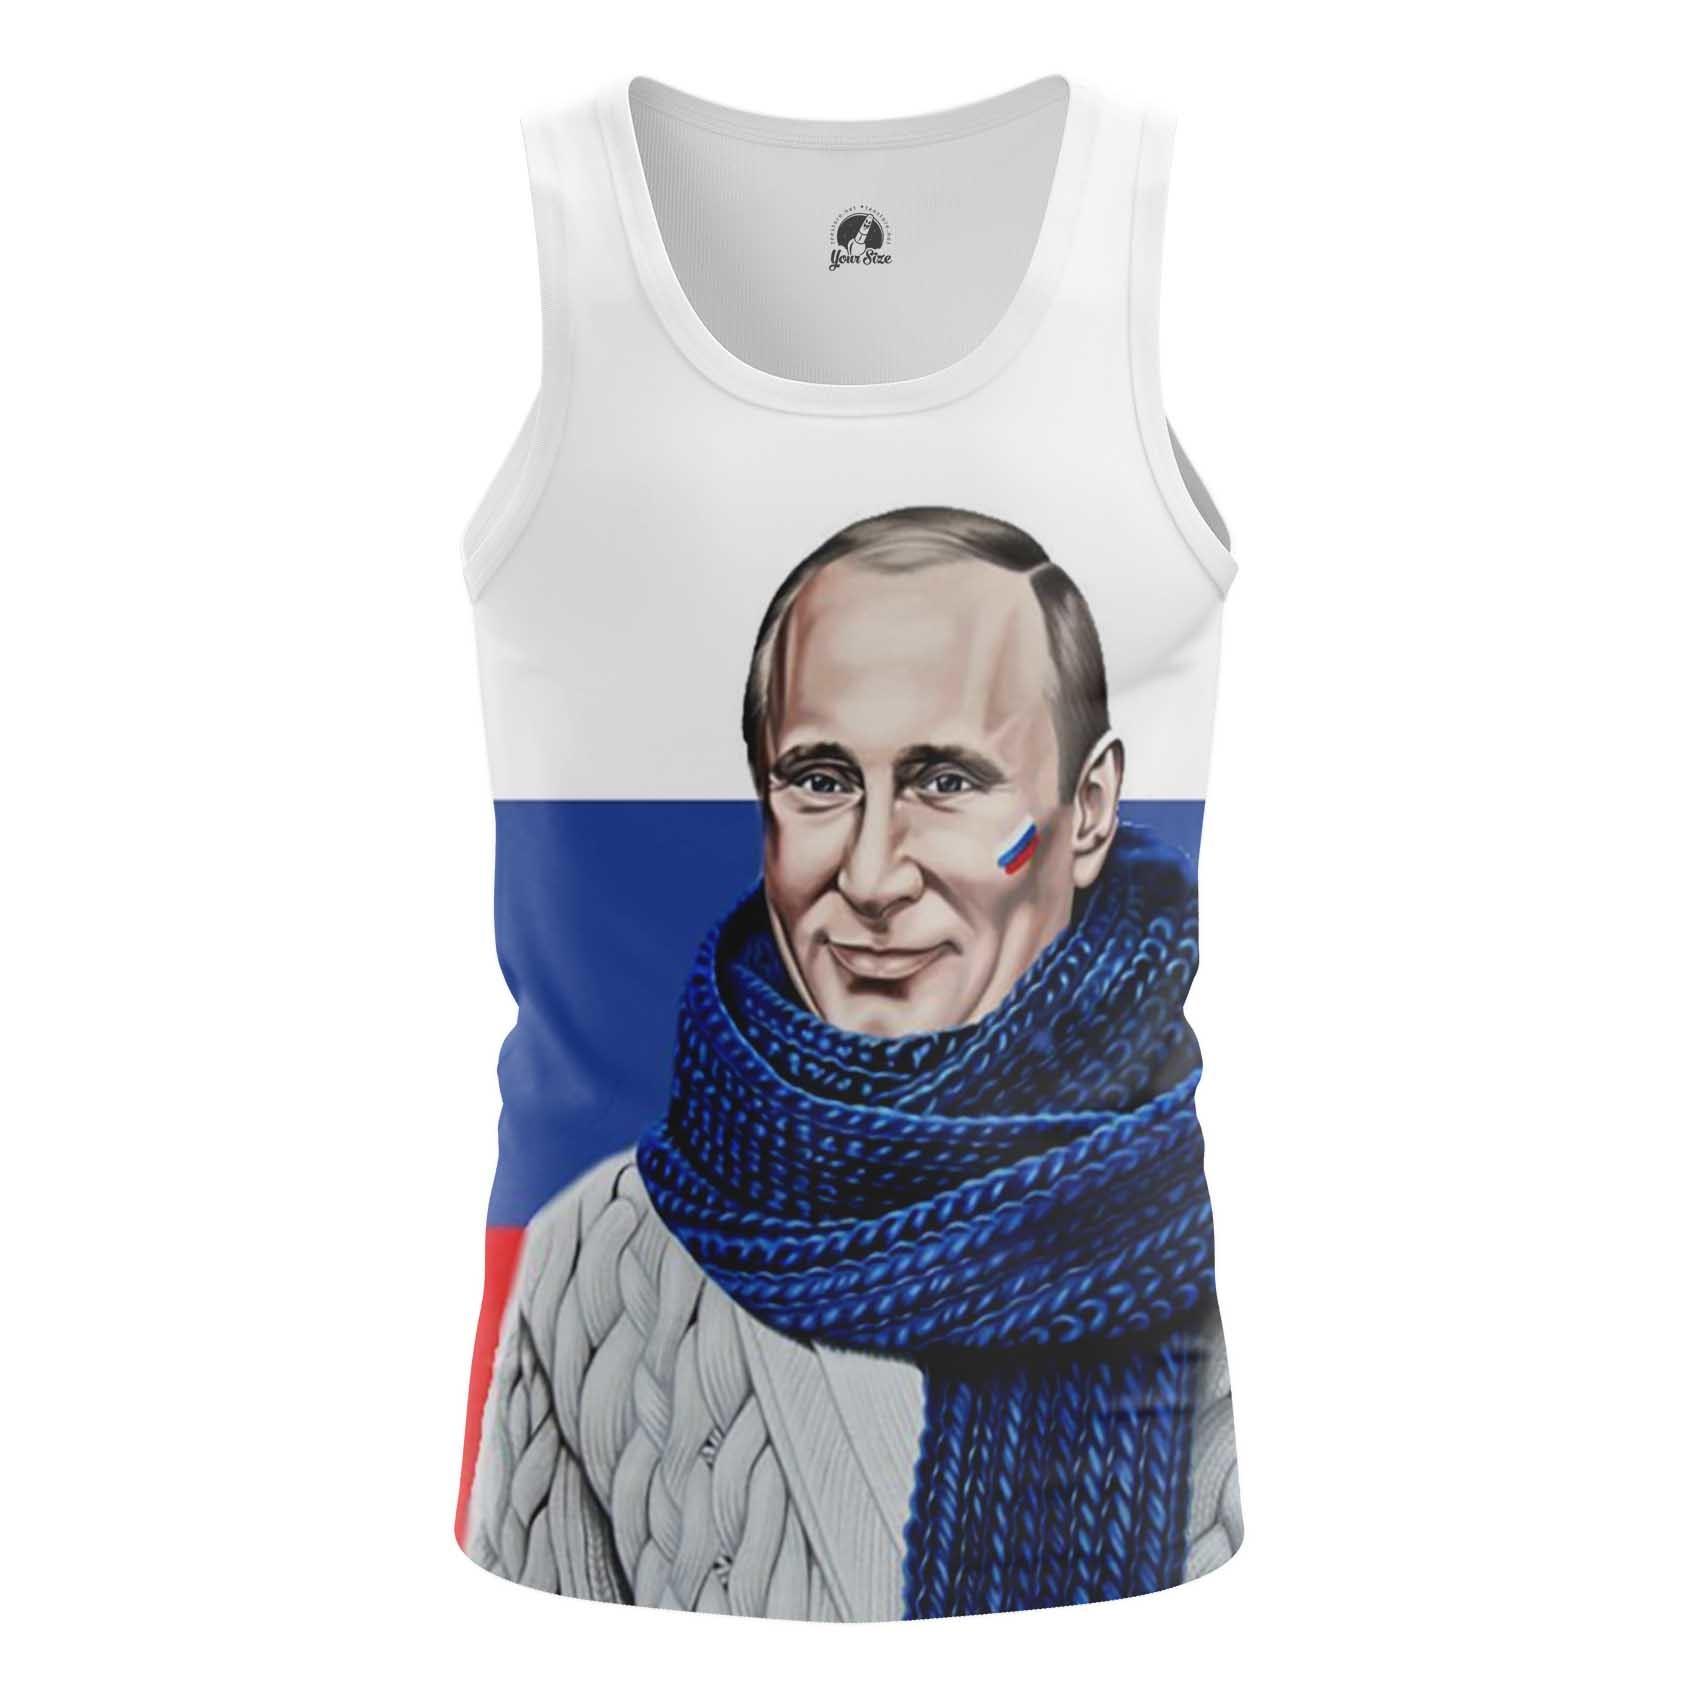 Merchandise Vladimir Putin Men'S T-Shirt Kindness Russian President